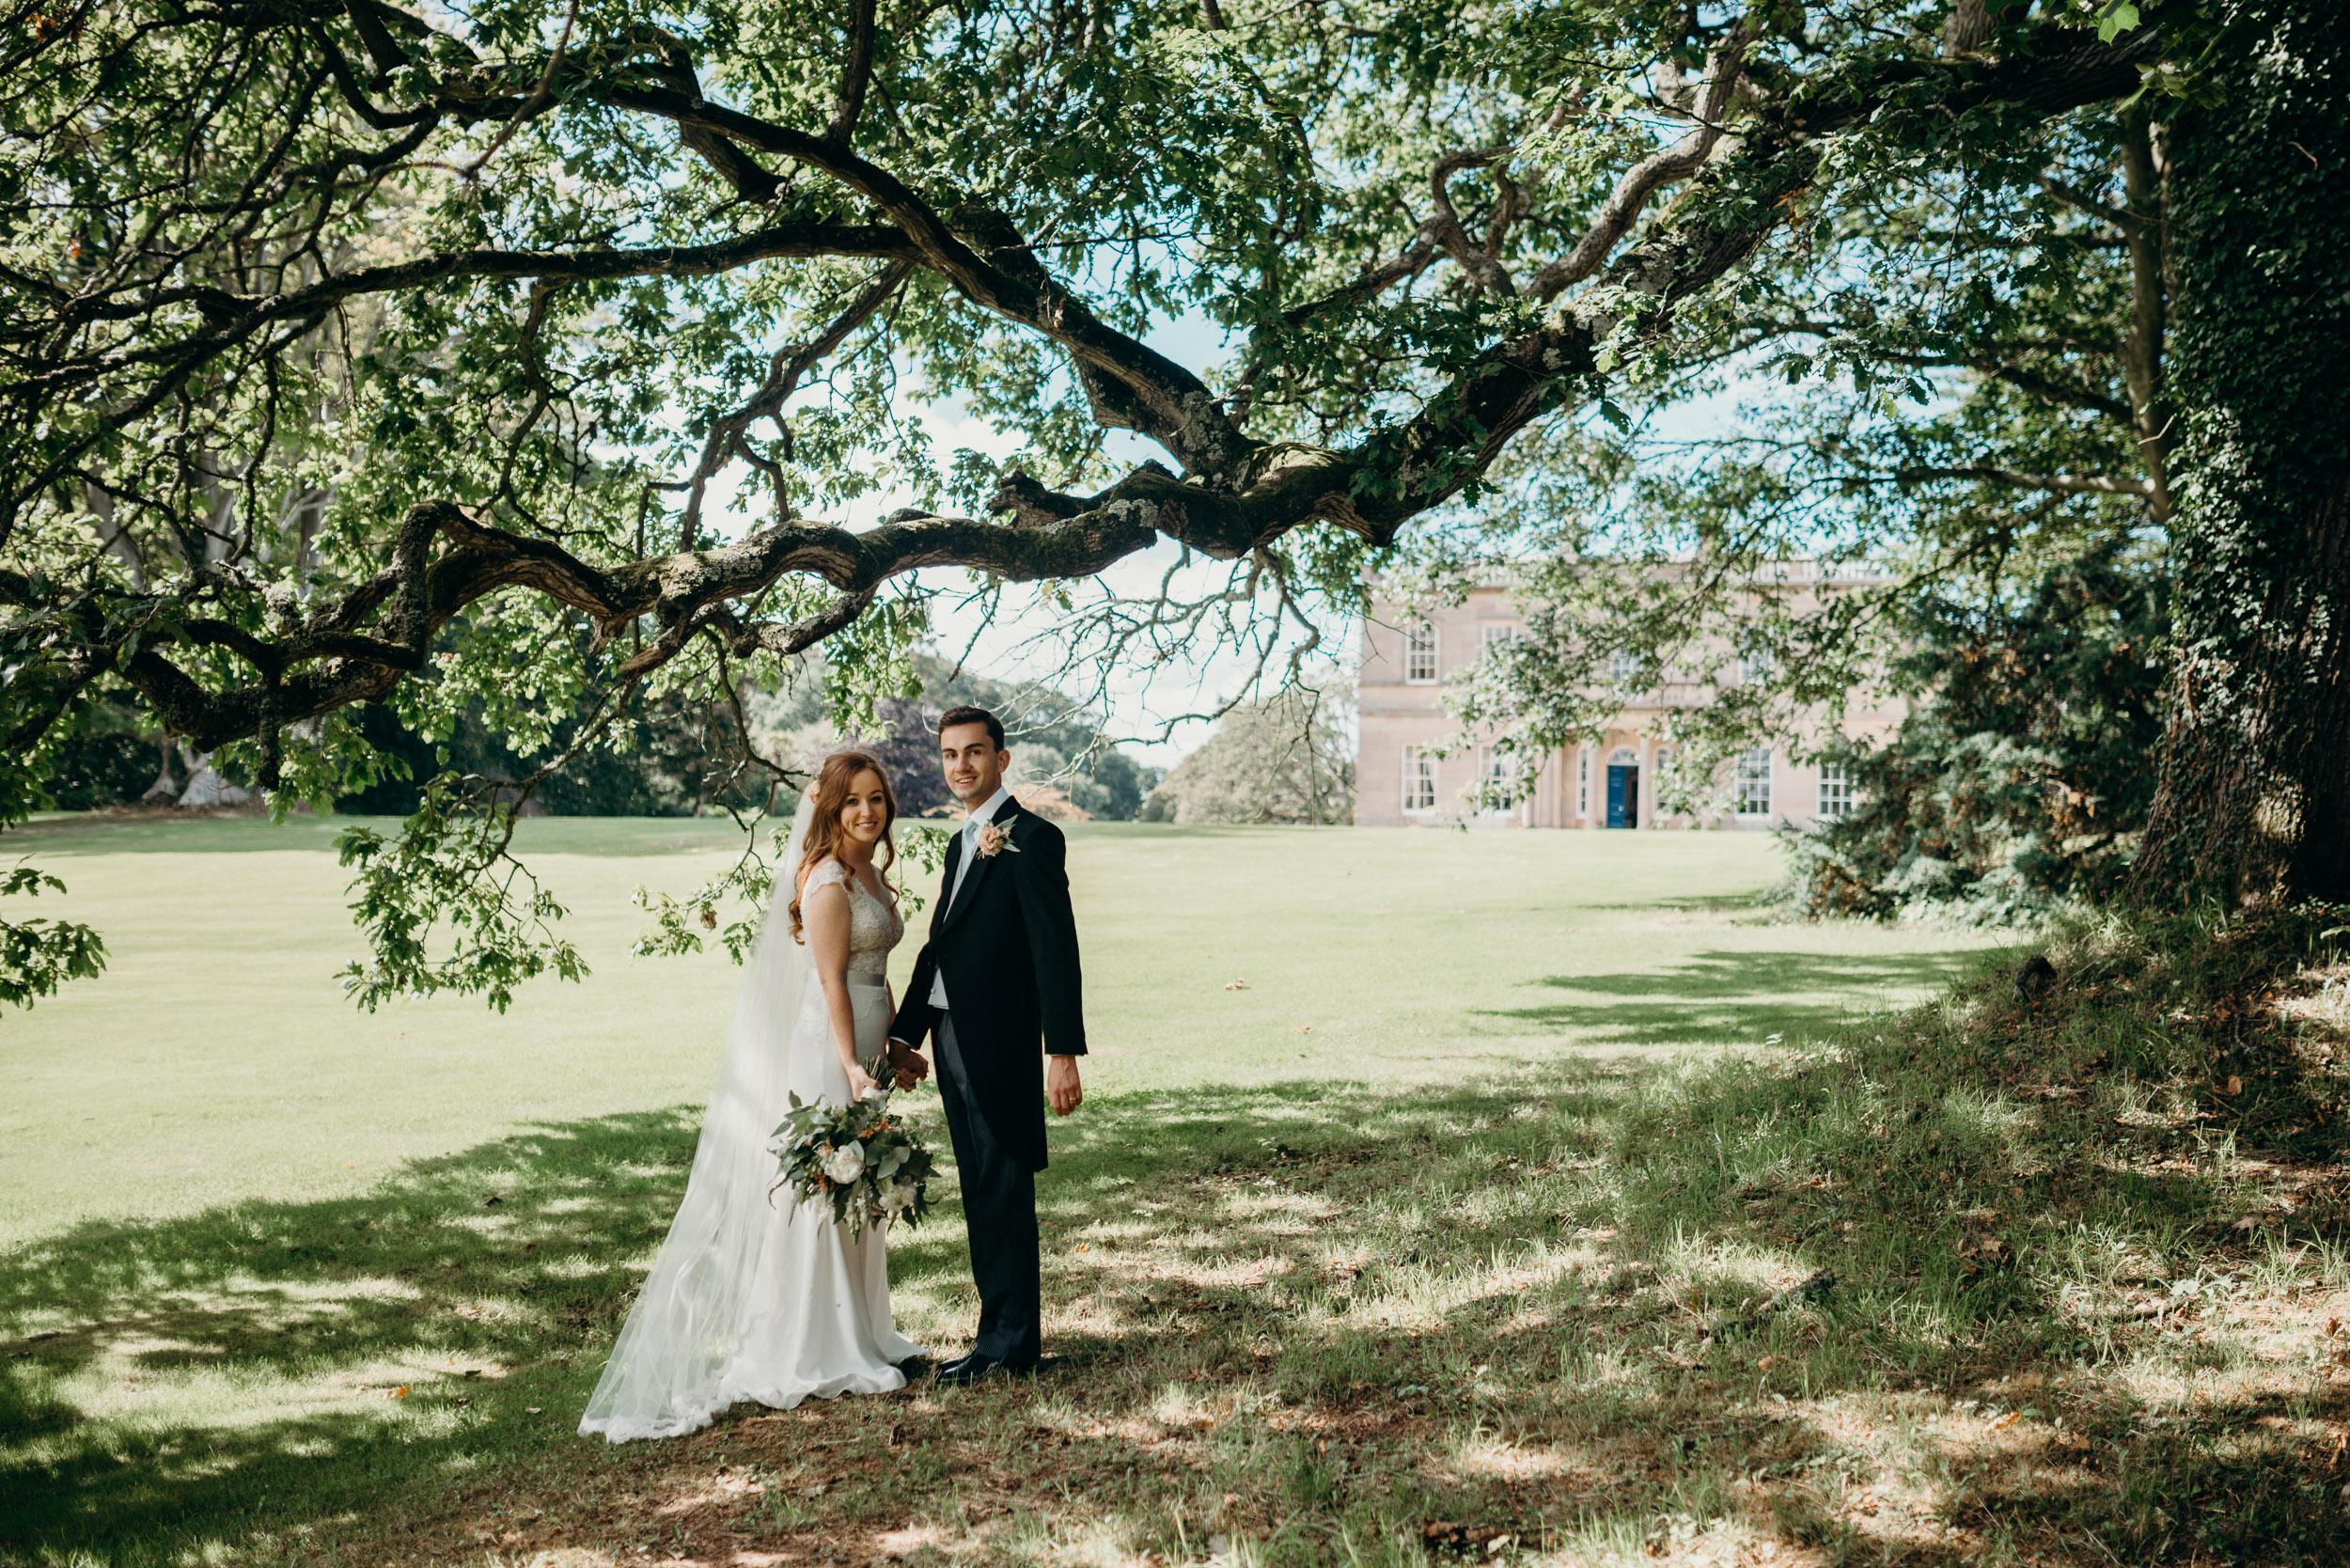 drenagh estate wedding photography-82.jpg